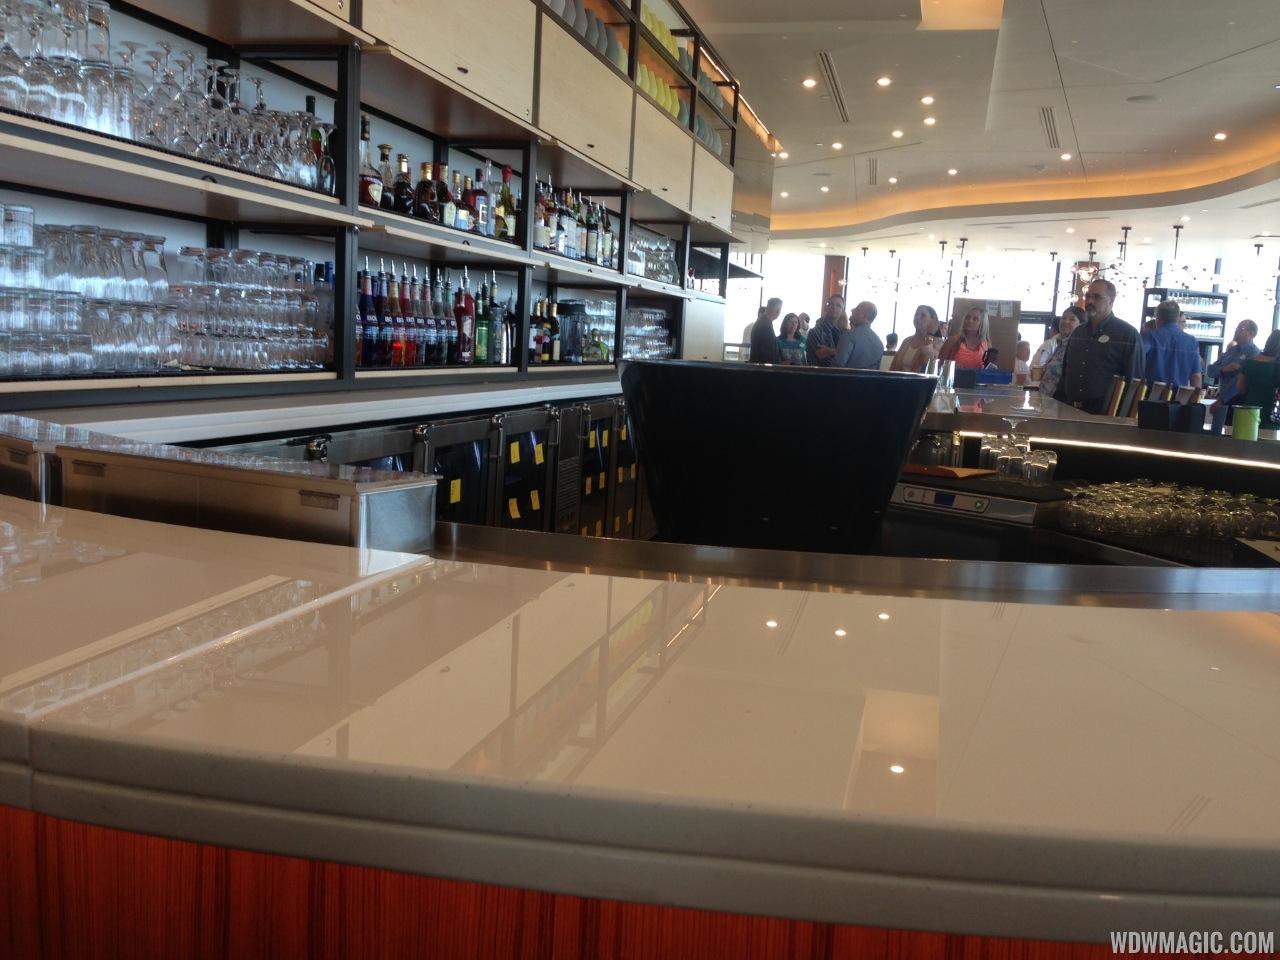 Inside the newly refurbished California Grill bar